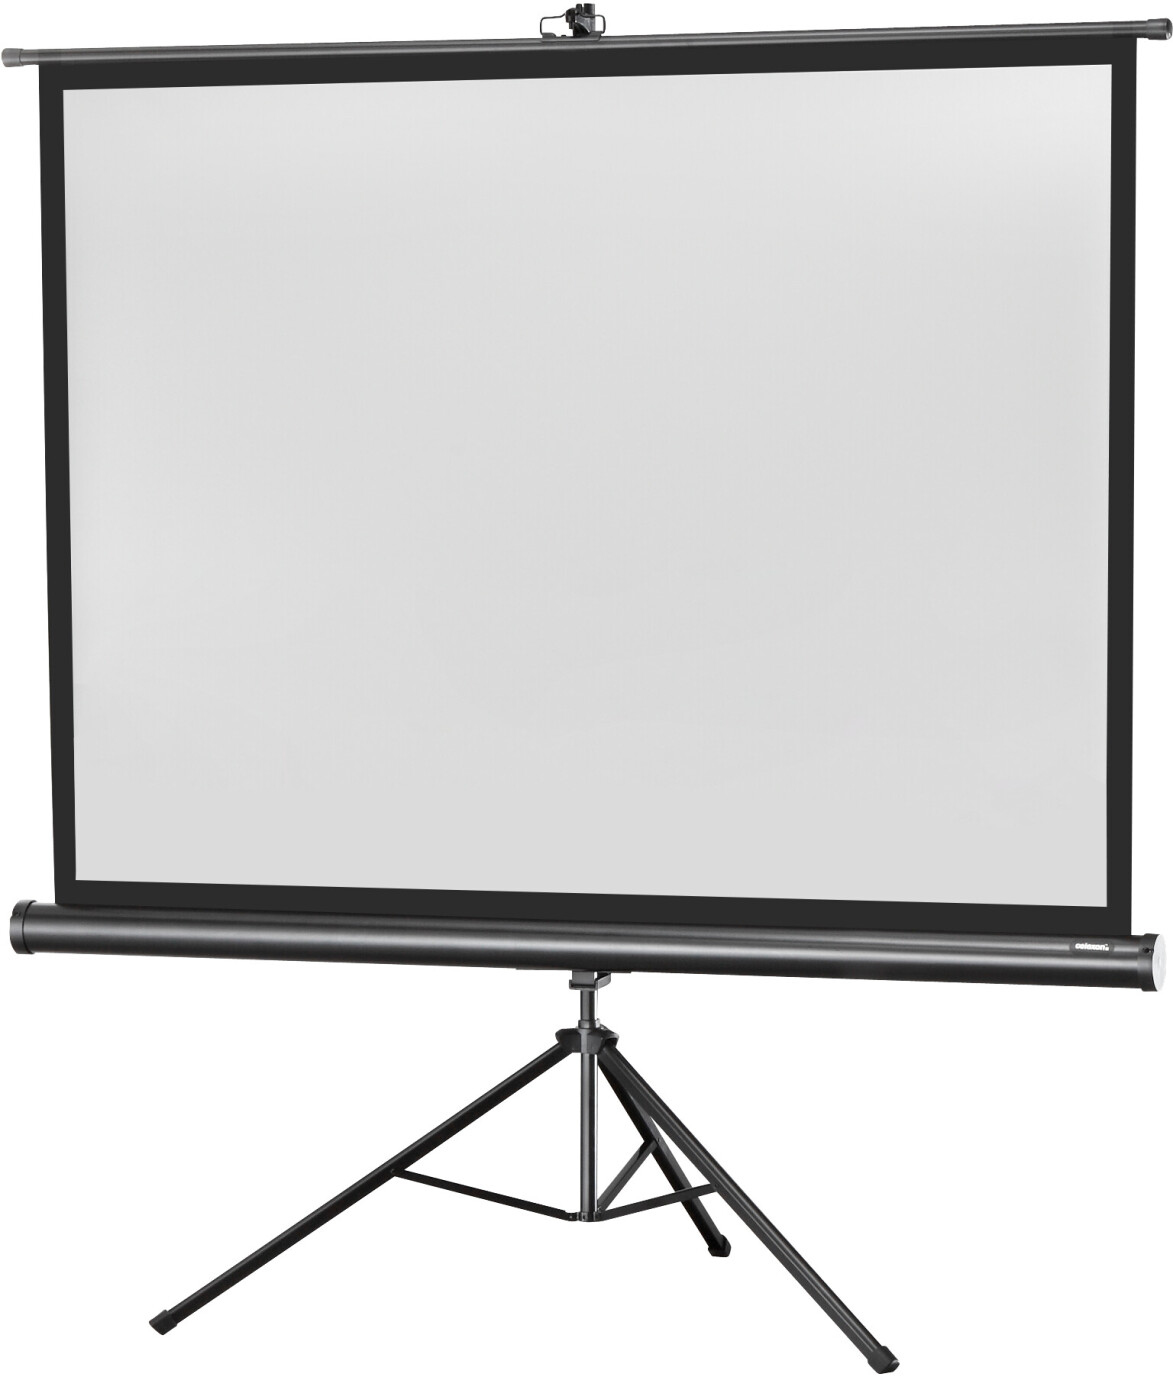 Celexon - Economy - 133cm x 100cm - 4:3 - Tripod Projector Screen